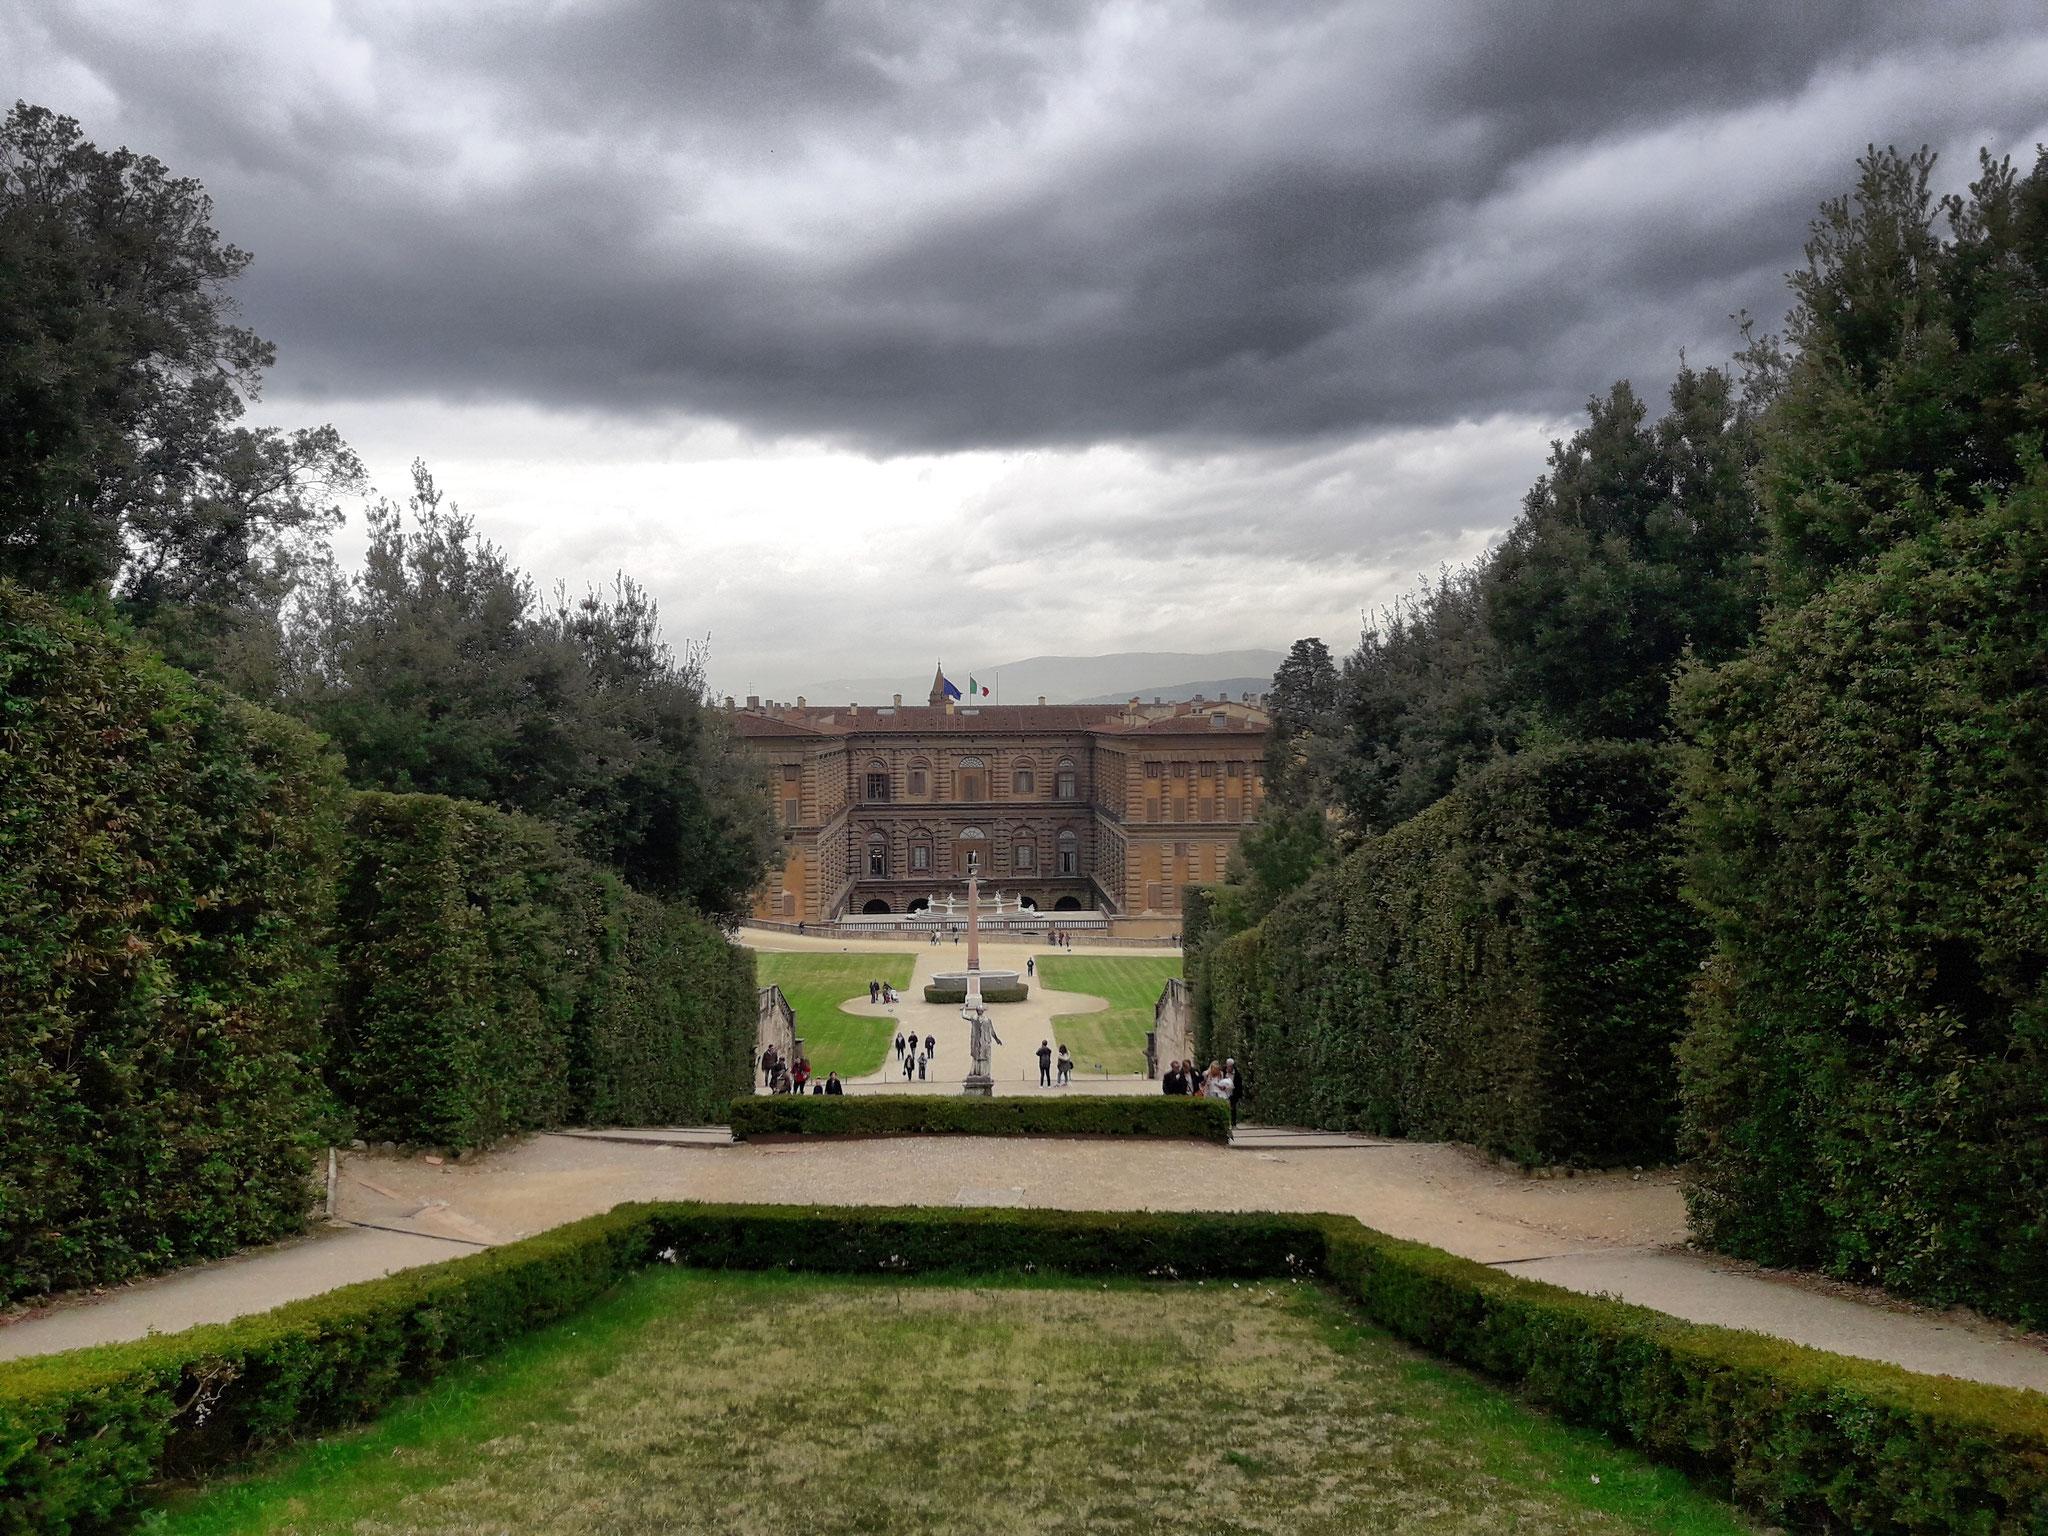 Palazzo Pitti and its garden